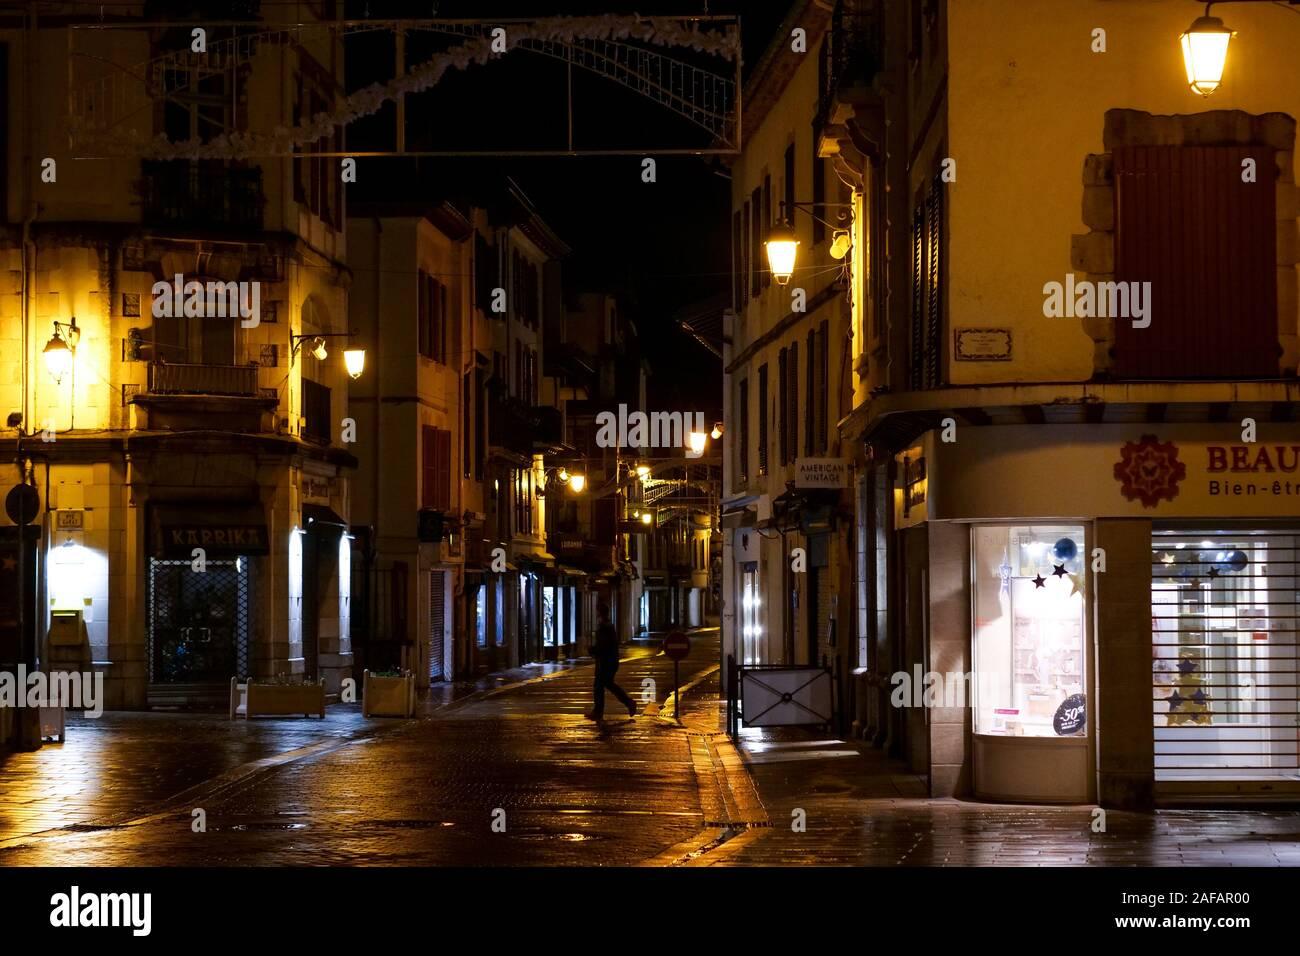 Night view in the streets of Saint-Jean de Luz, Pyrénées-Atlantiques, France Stock Photo